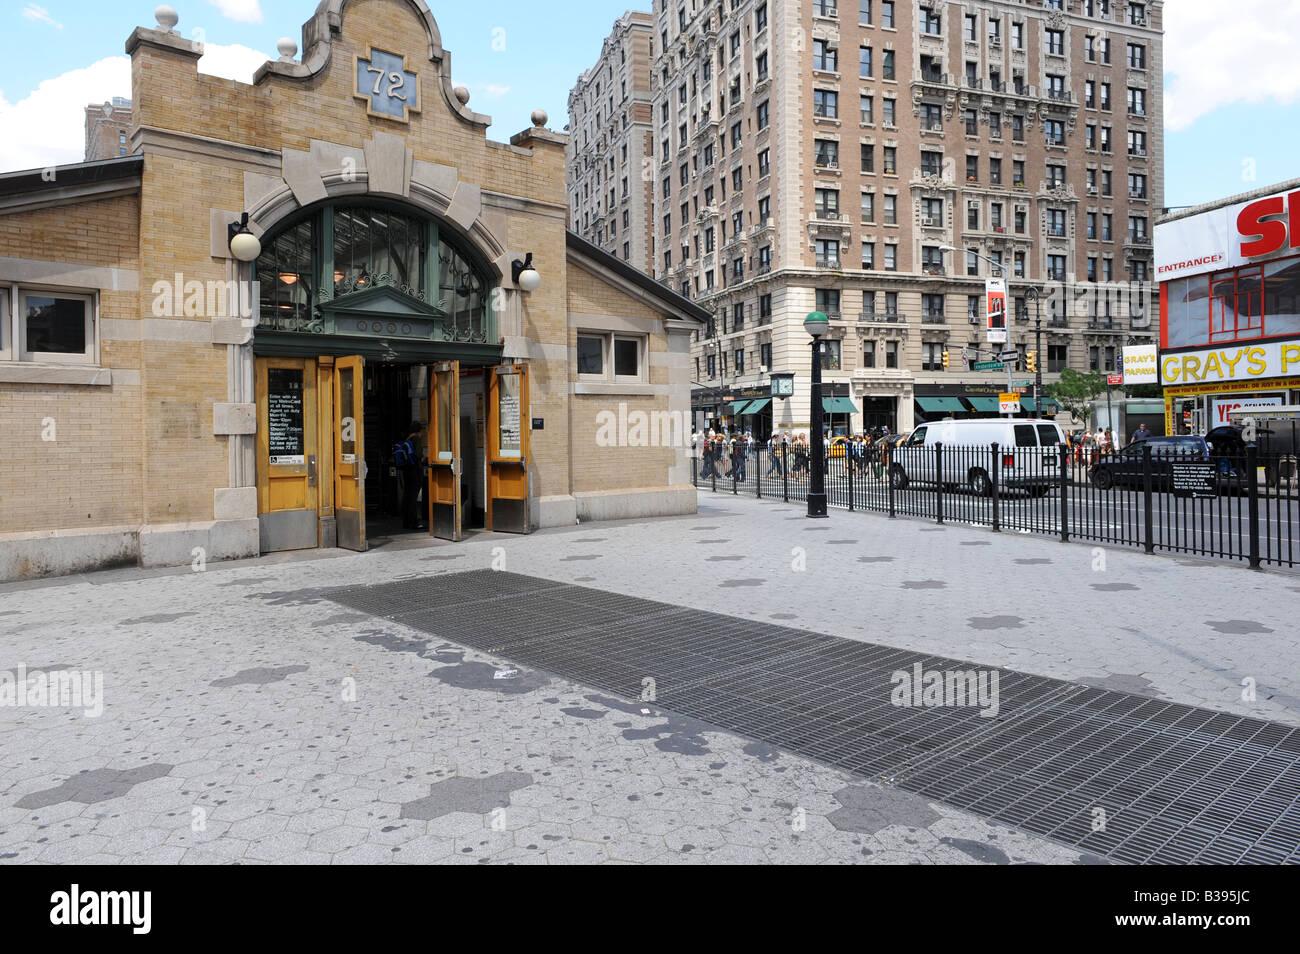 72nd Street Subway Map.72nd Street Station Stock Photos 72nd Street Station Stock Images